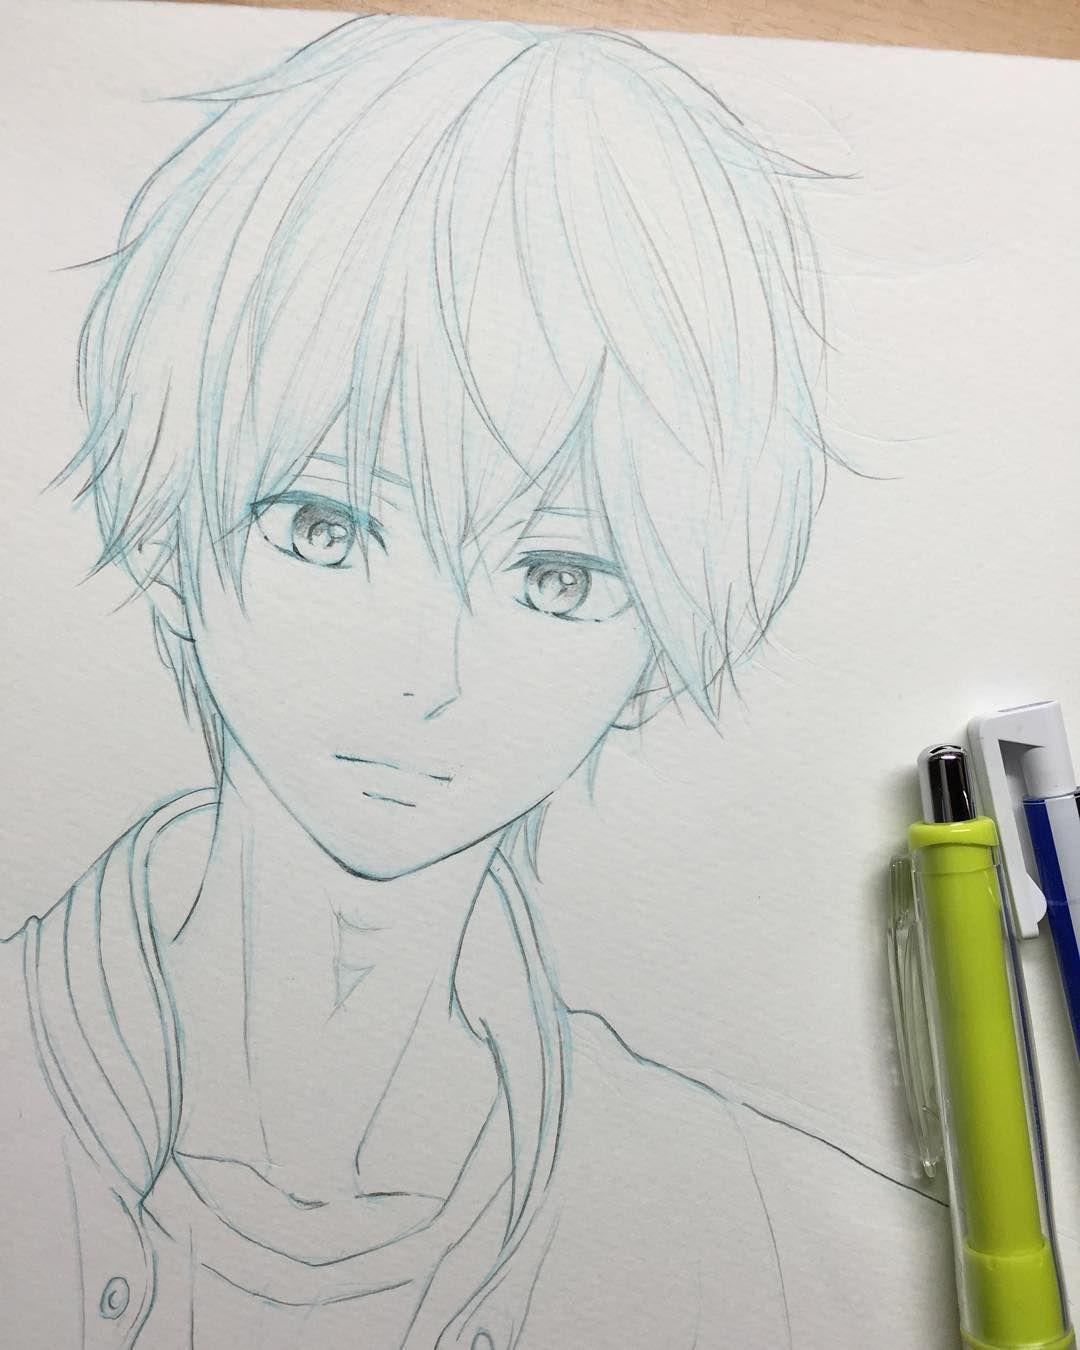 Haru matsu bokura asakura towa rie saukra0811 crear anime best anime drawings